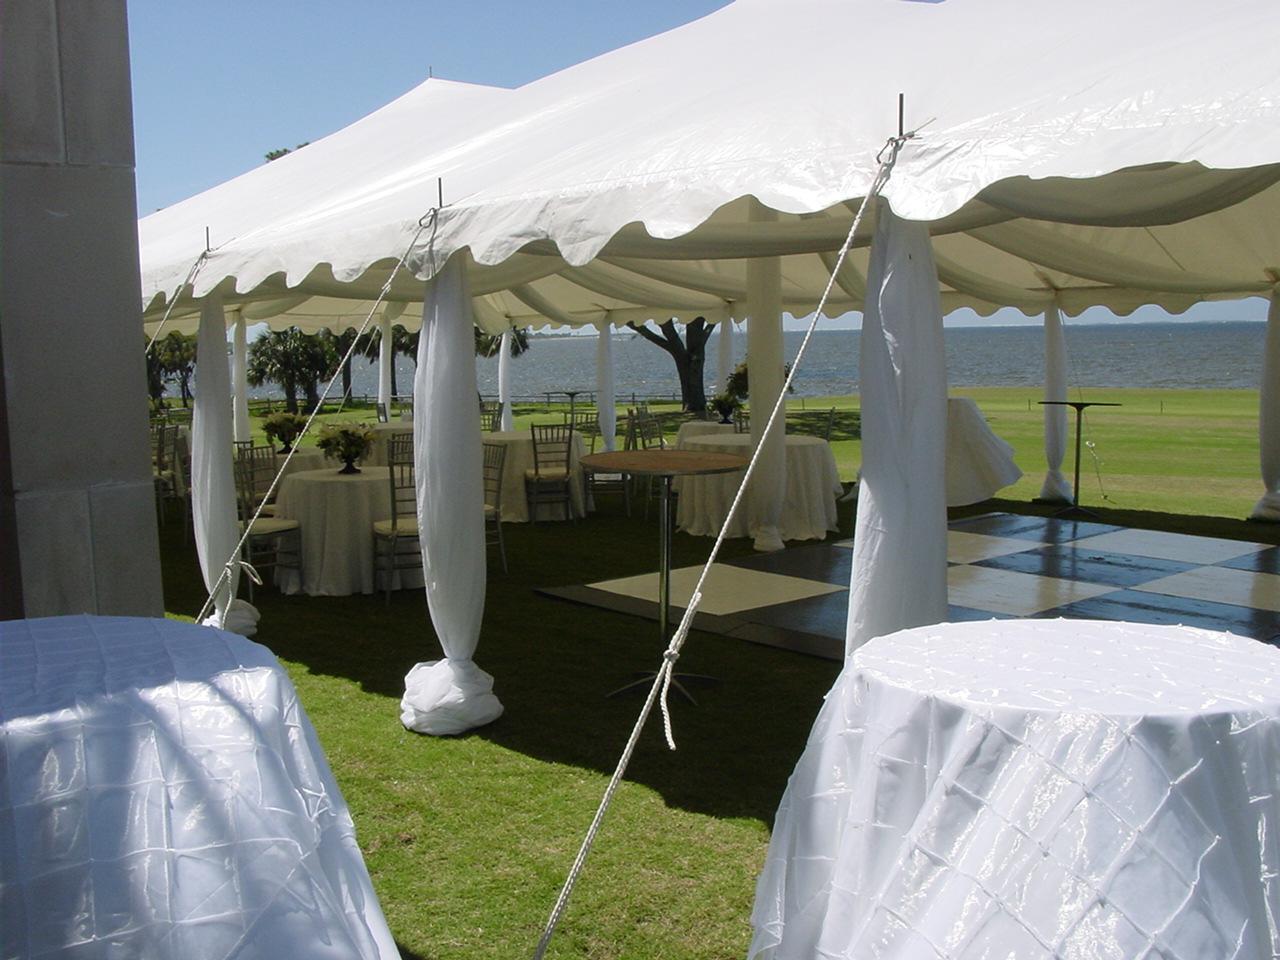 Indoor Vs Outdoor Weddings: Sophonie's Blog: Of These Glass Fishbowls